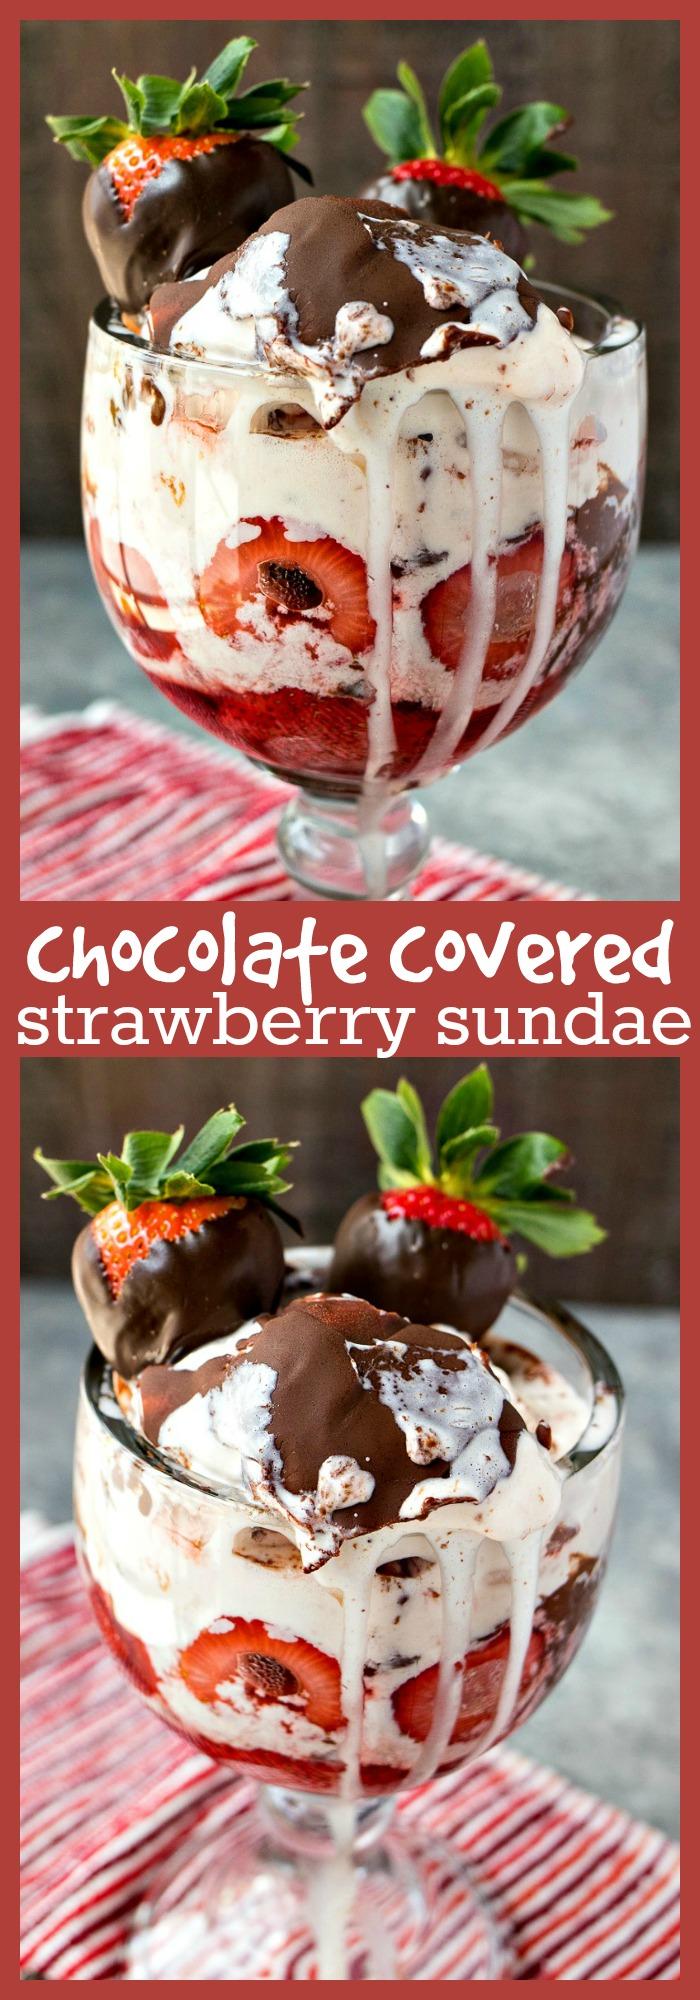 Chocolate Covered Strawberry Sundae photo collage